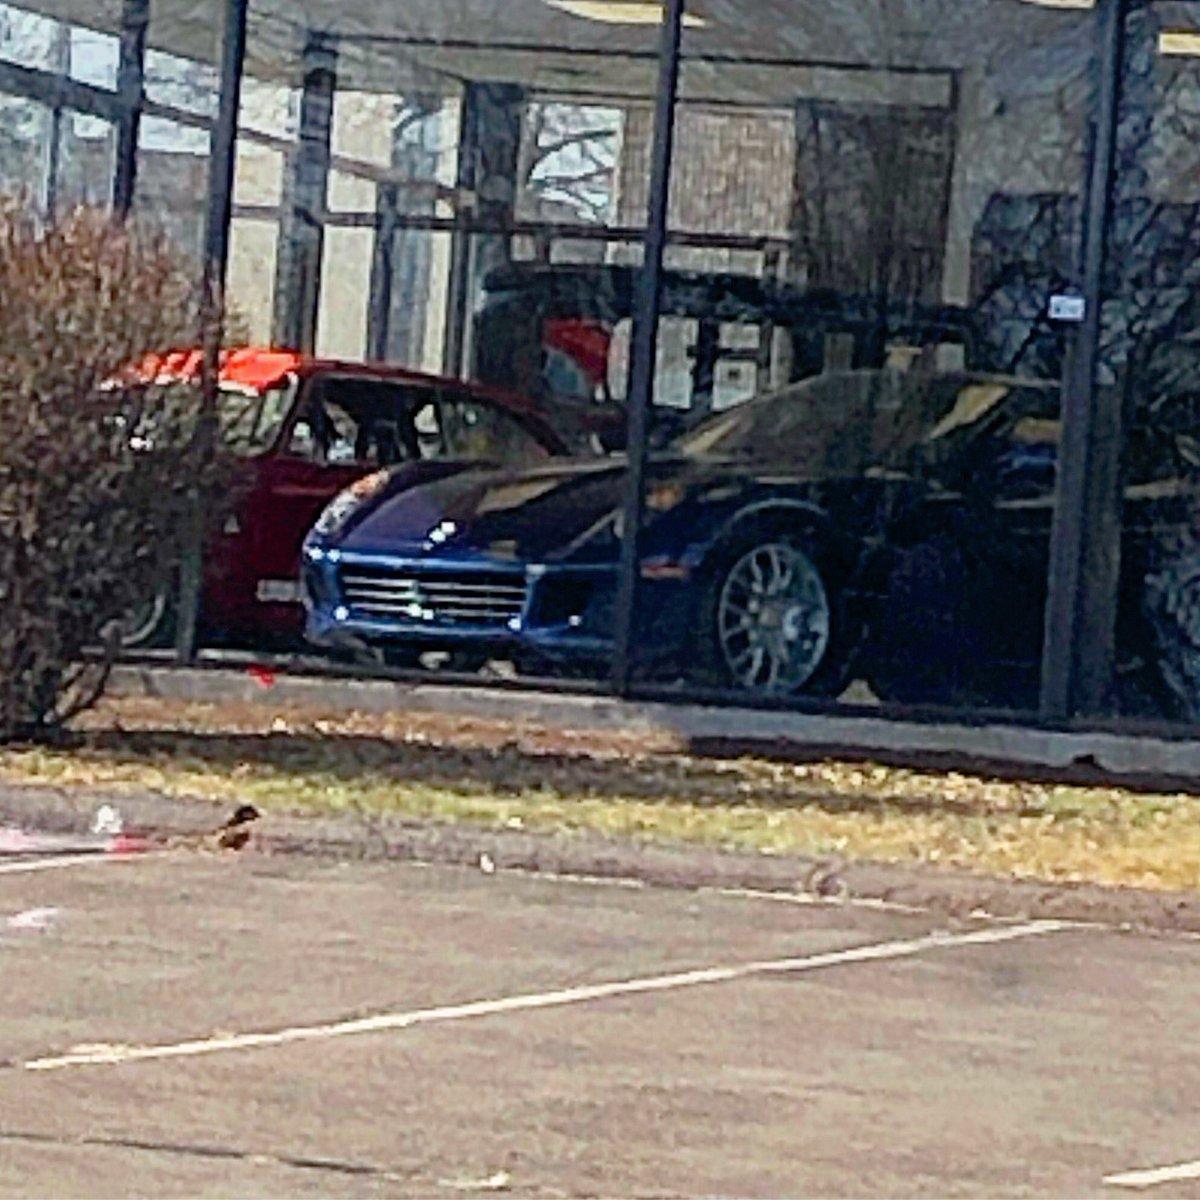 Found this @Ferrari 599 in a showroom window. What a beautiful car. 😍